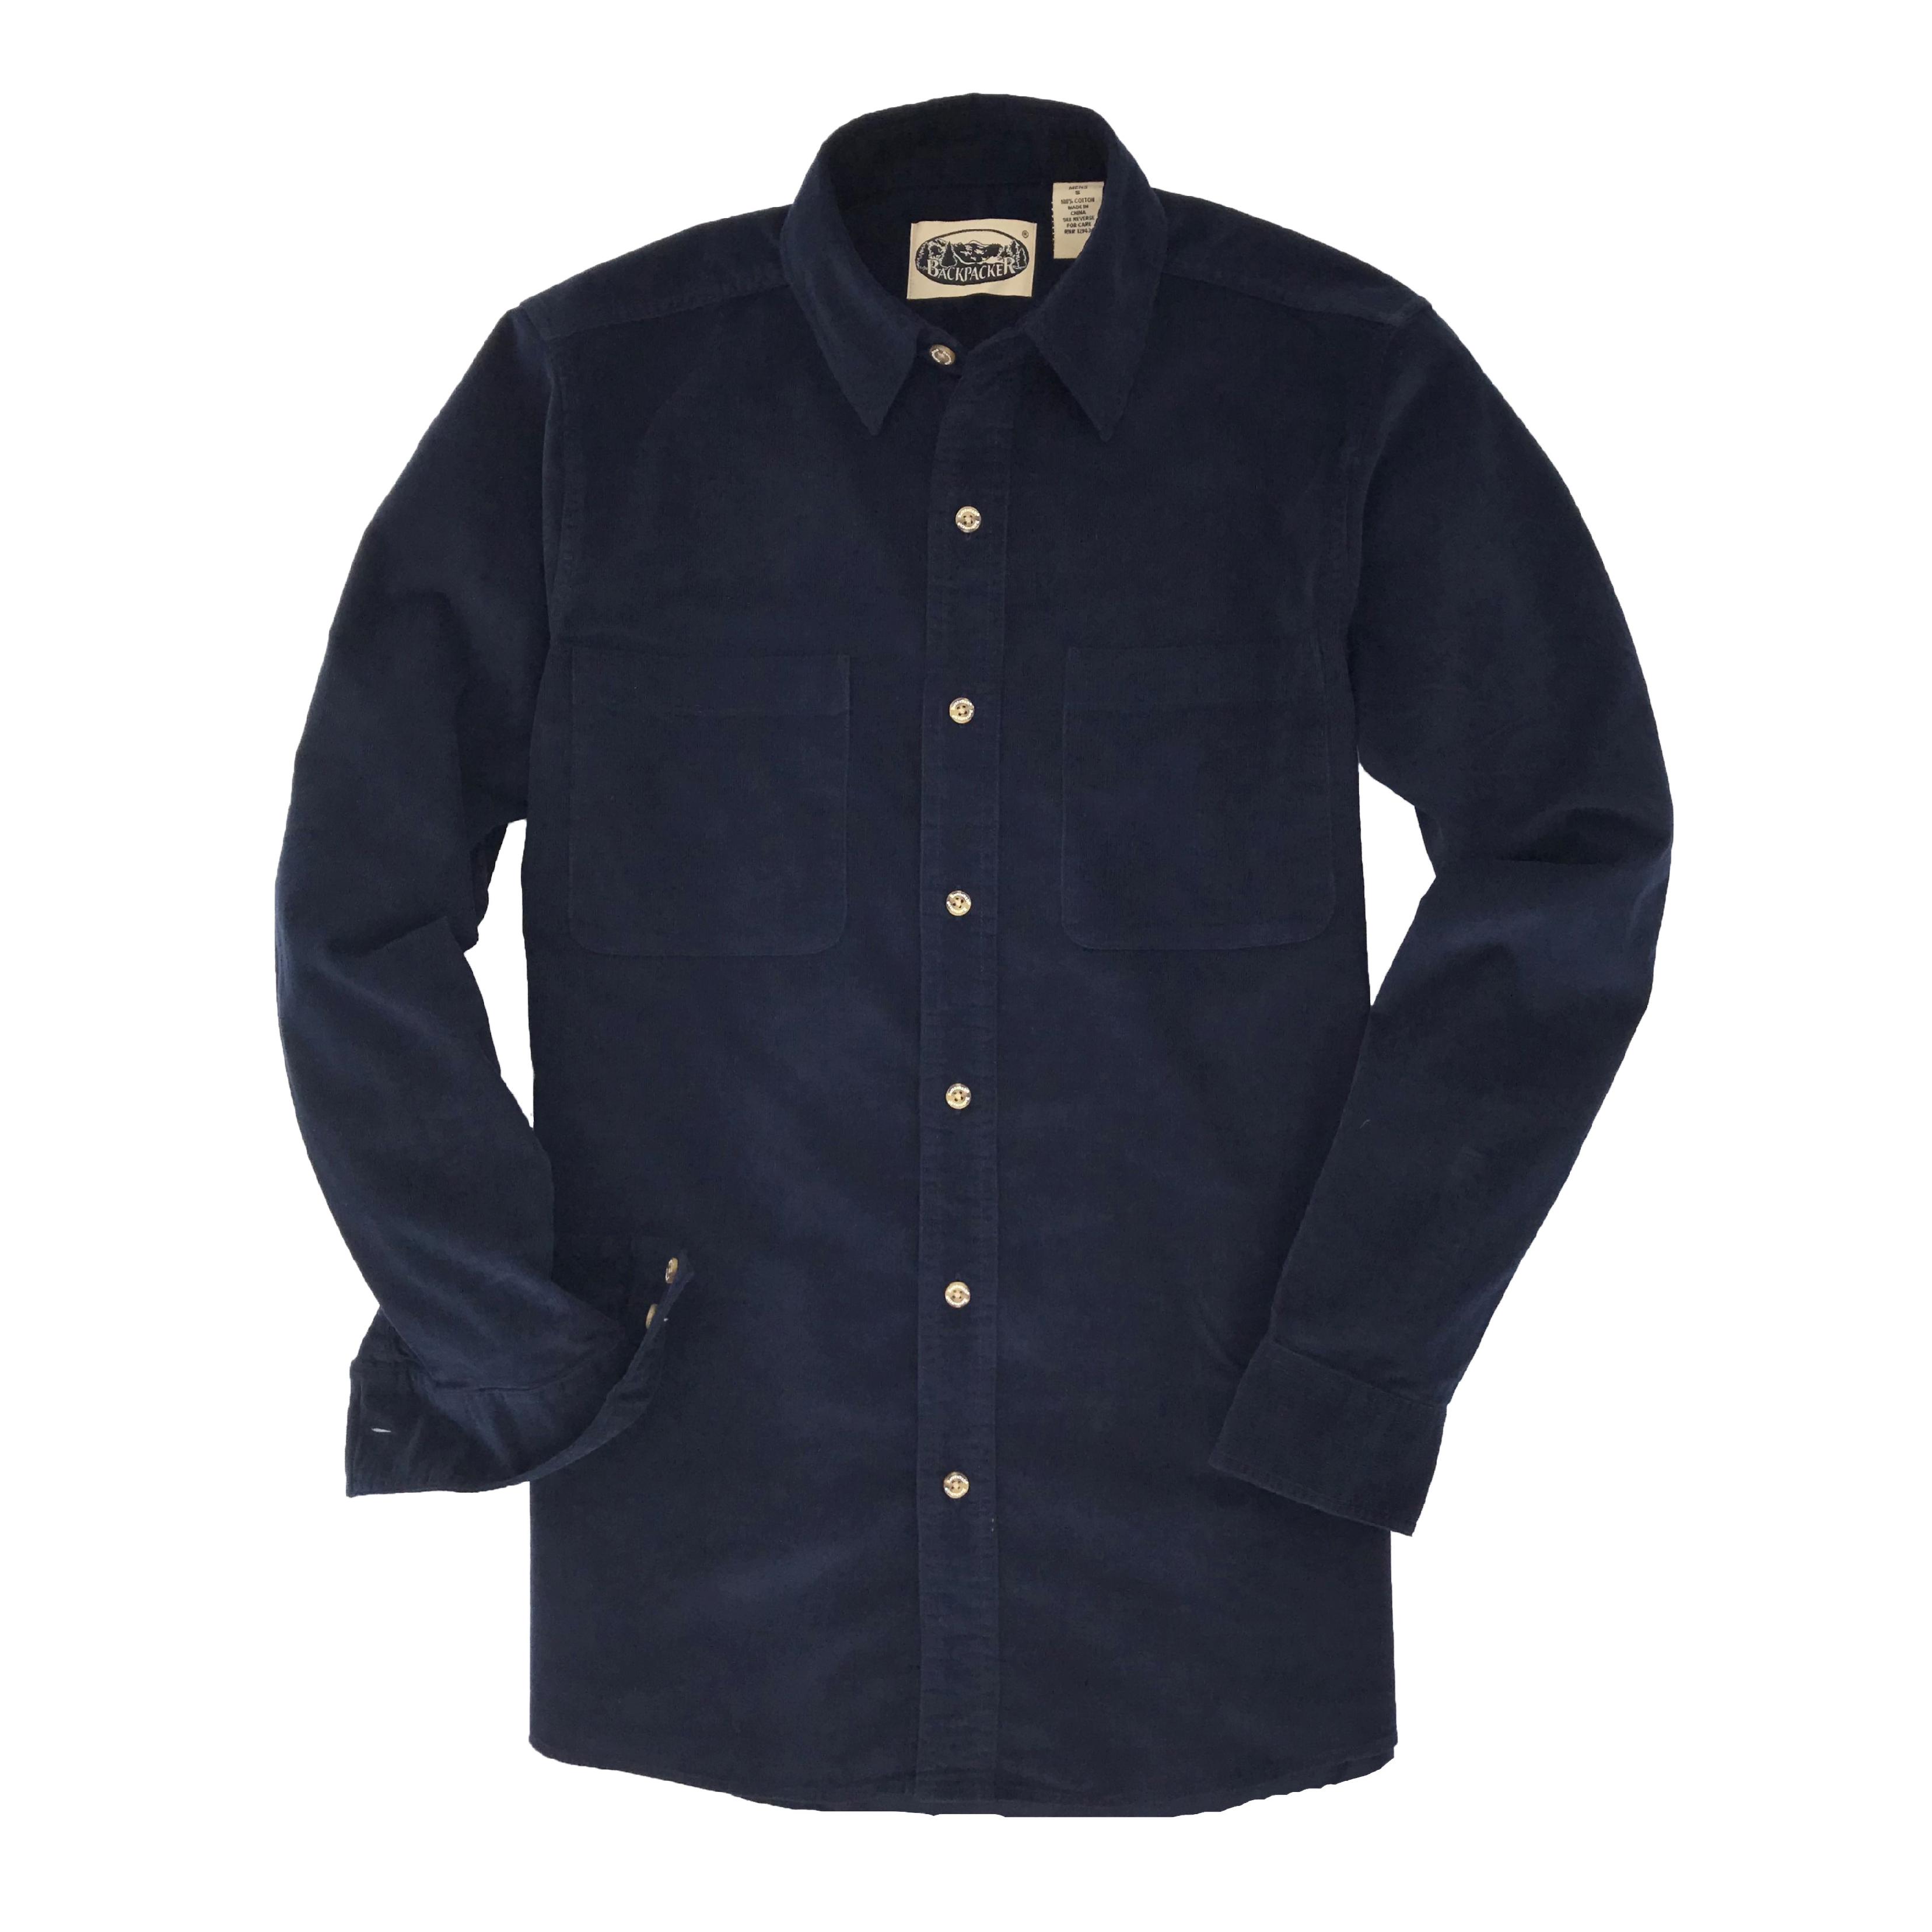 Backpacker Men's Cliff Walk Corduroy Shirt (9155)